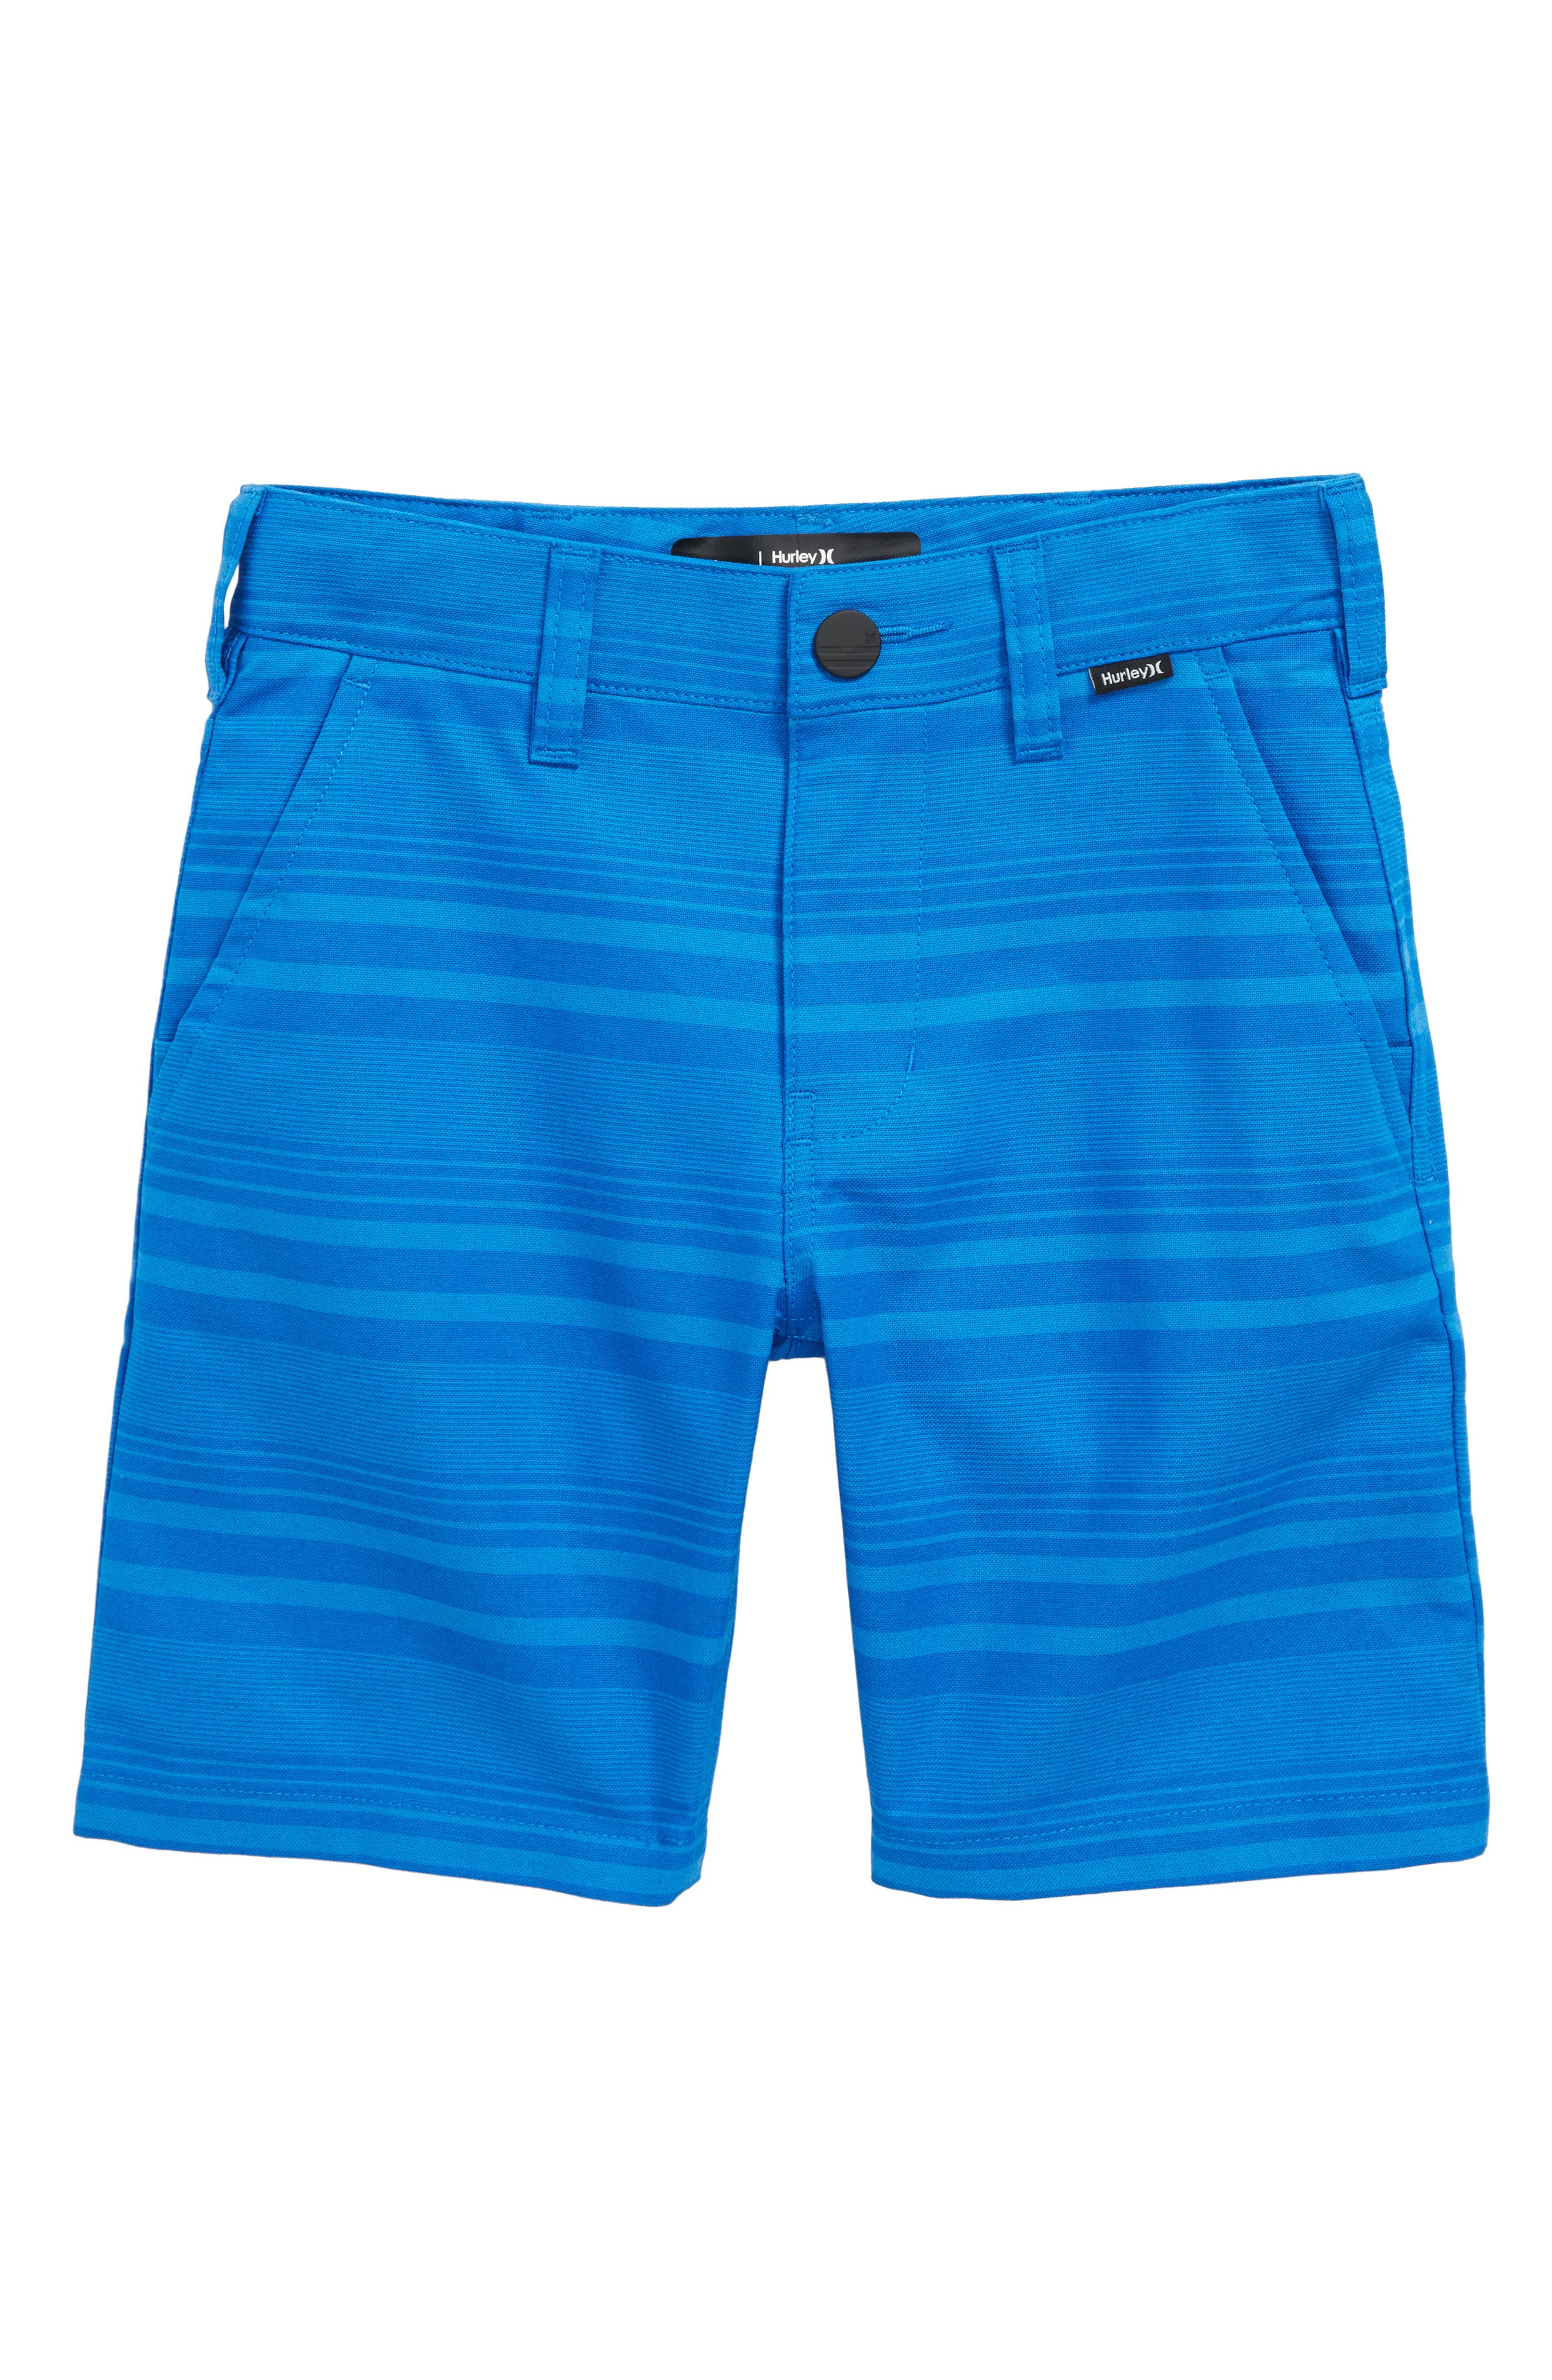 Jones Hybrid Shorts,                             Main thumbnail 1, color,                             400